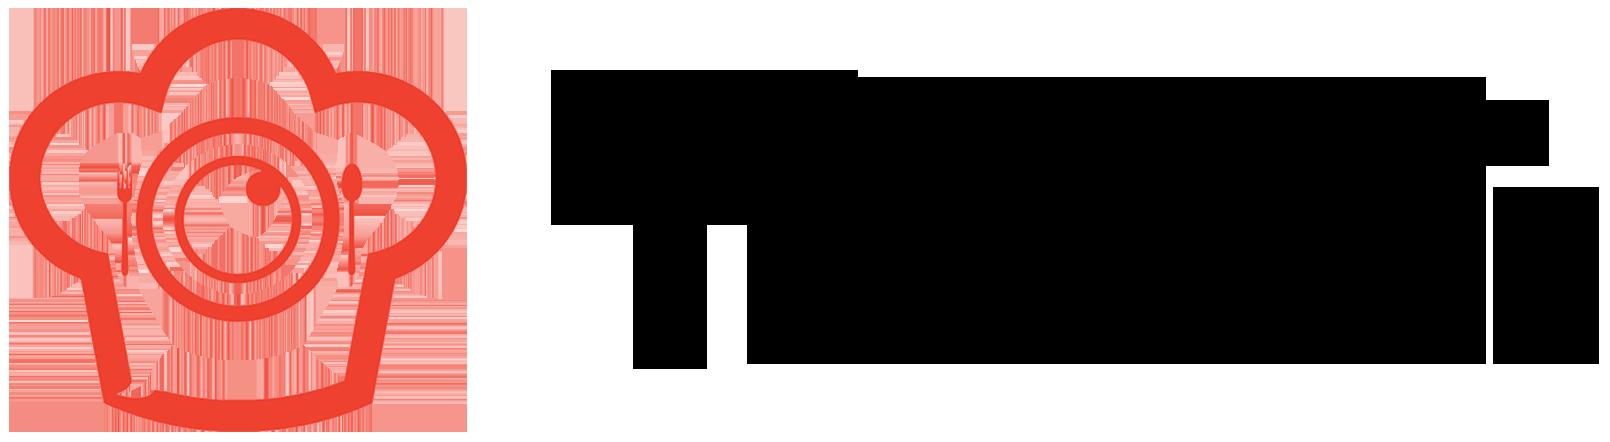 لوگوی ارائه استارتاپ تاندوری